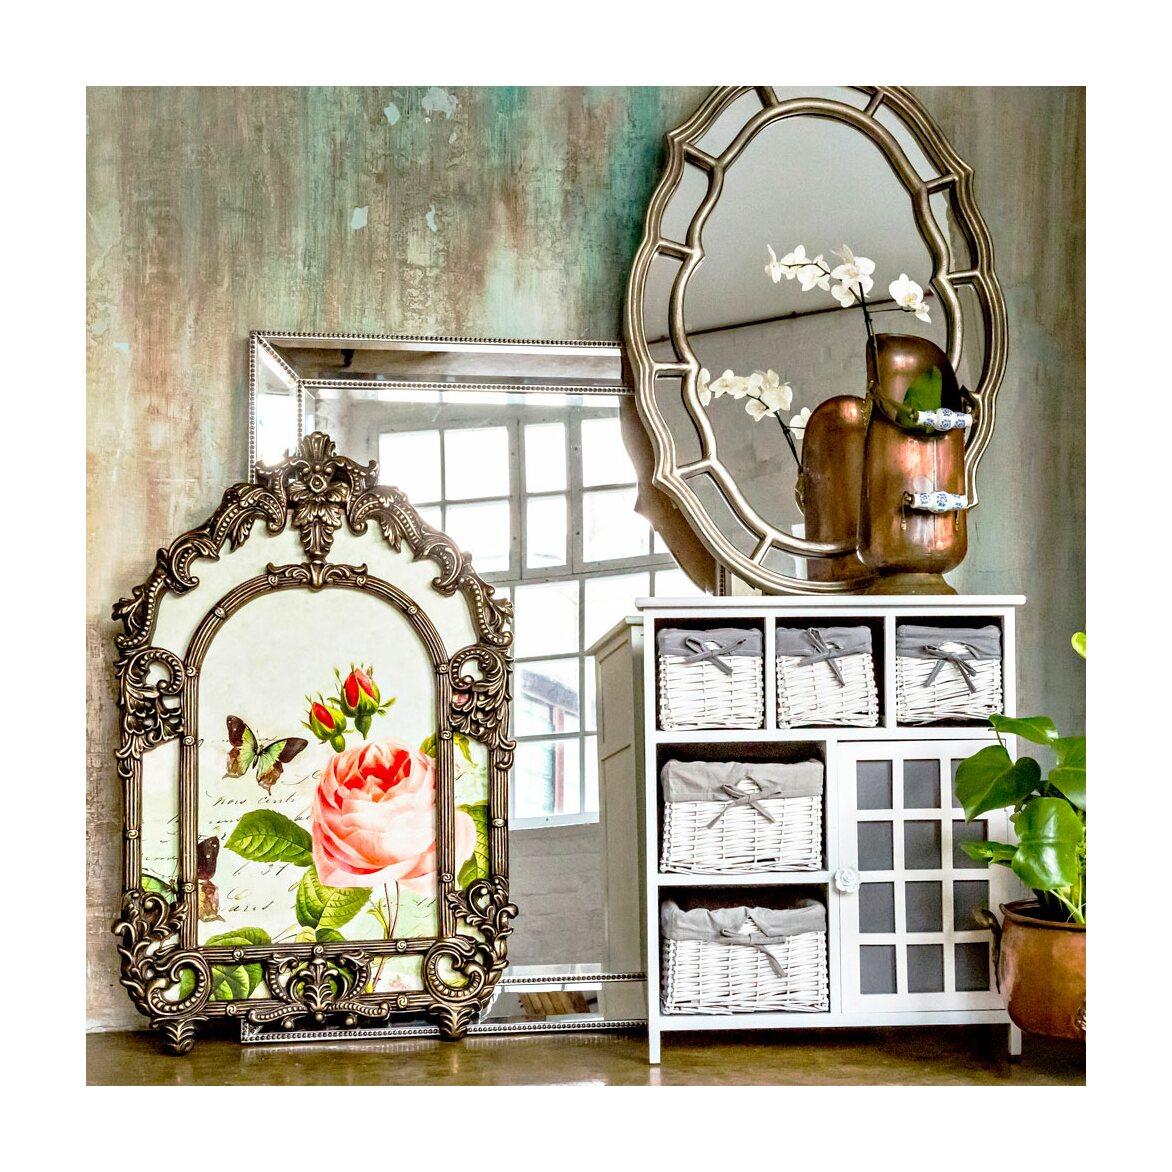 Настенное зеркало «Марлен» 3 | Настенные зеркала Kingsby